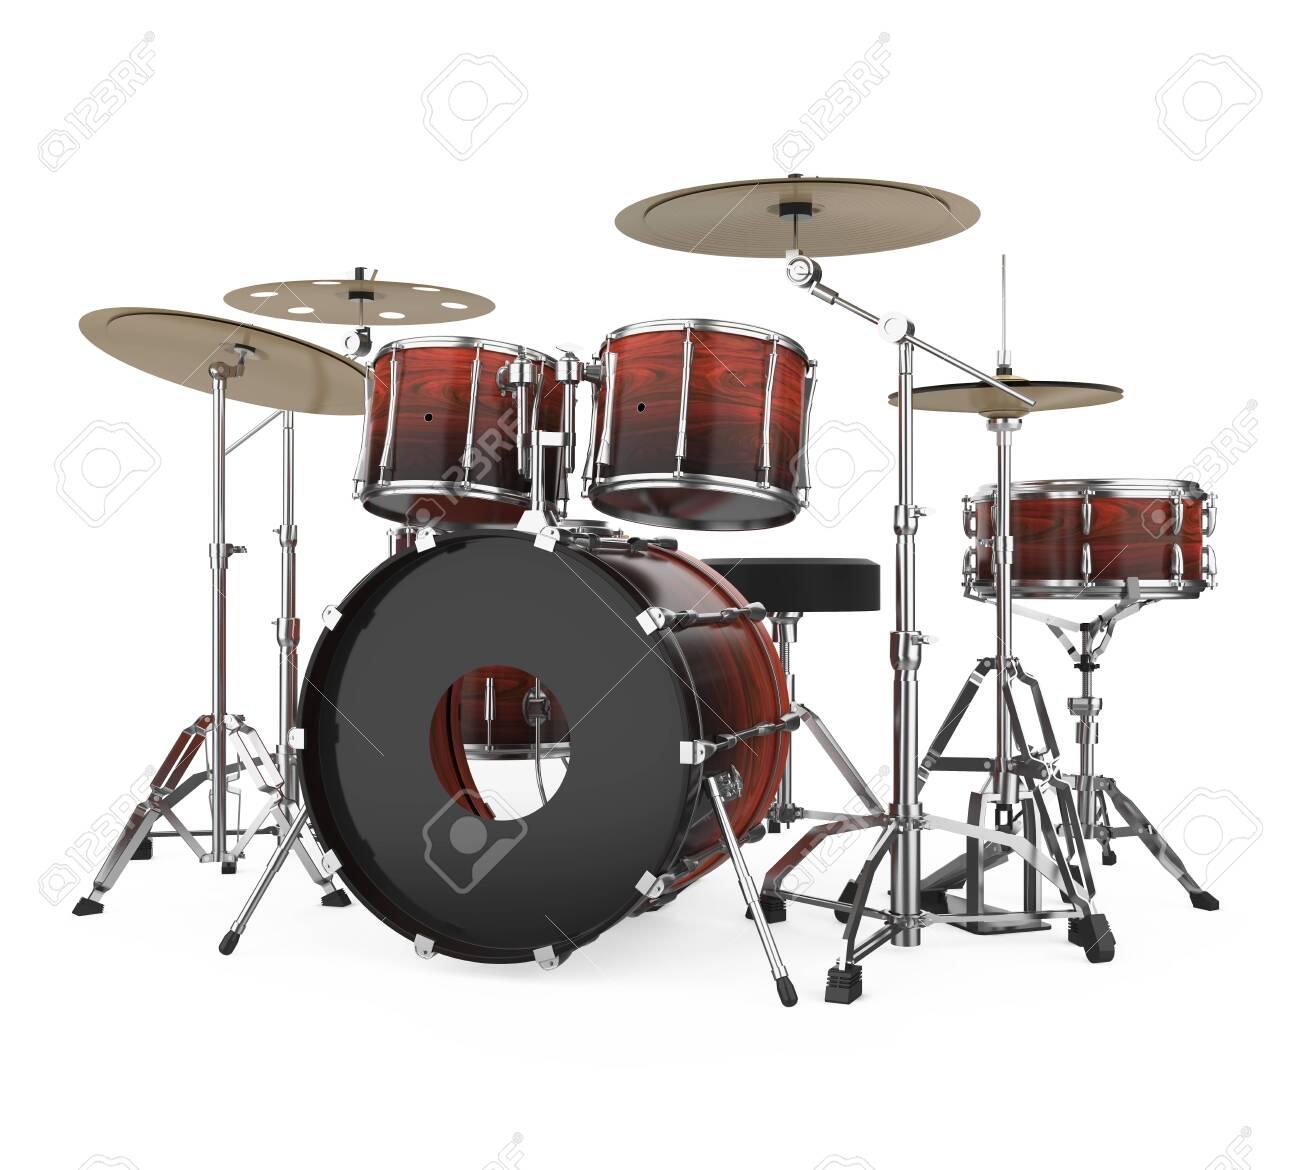 Drum Kit Isolated - 146544687